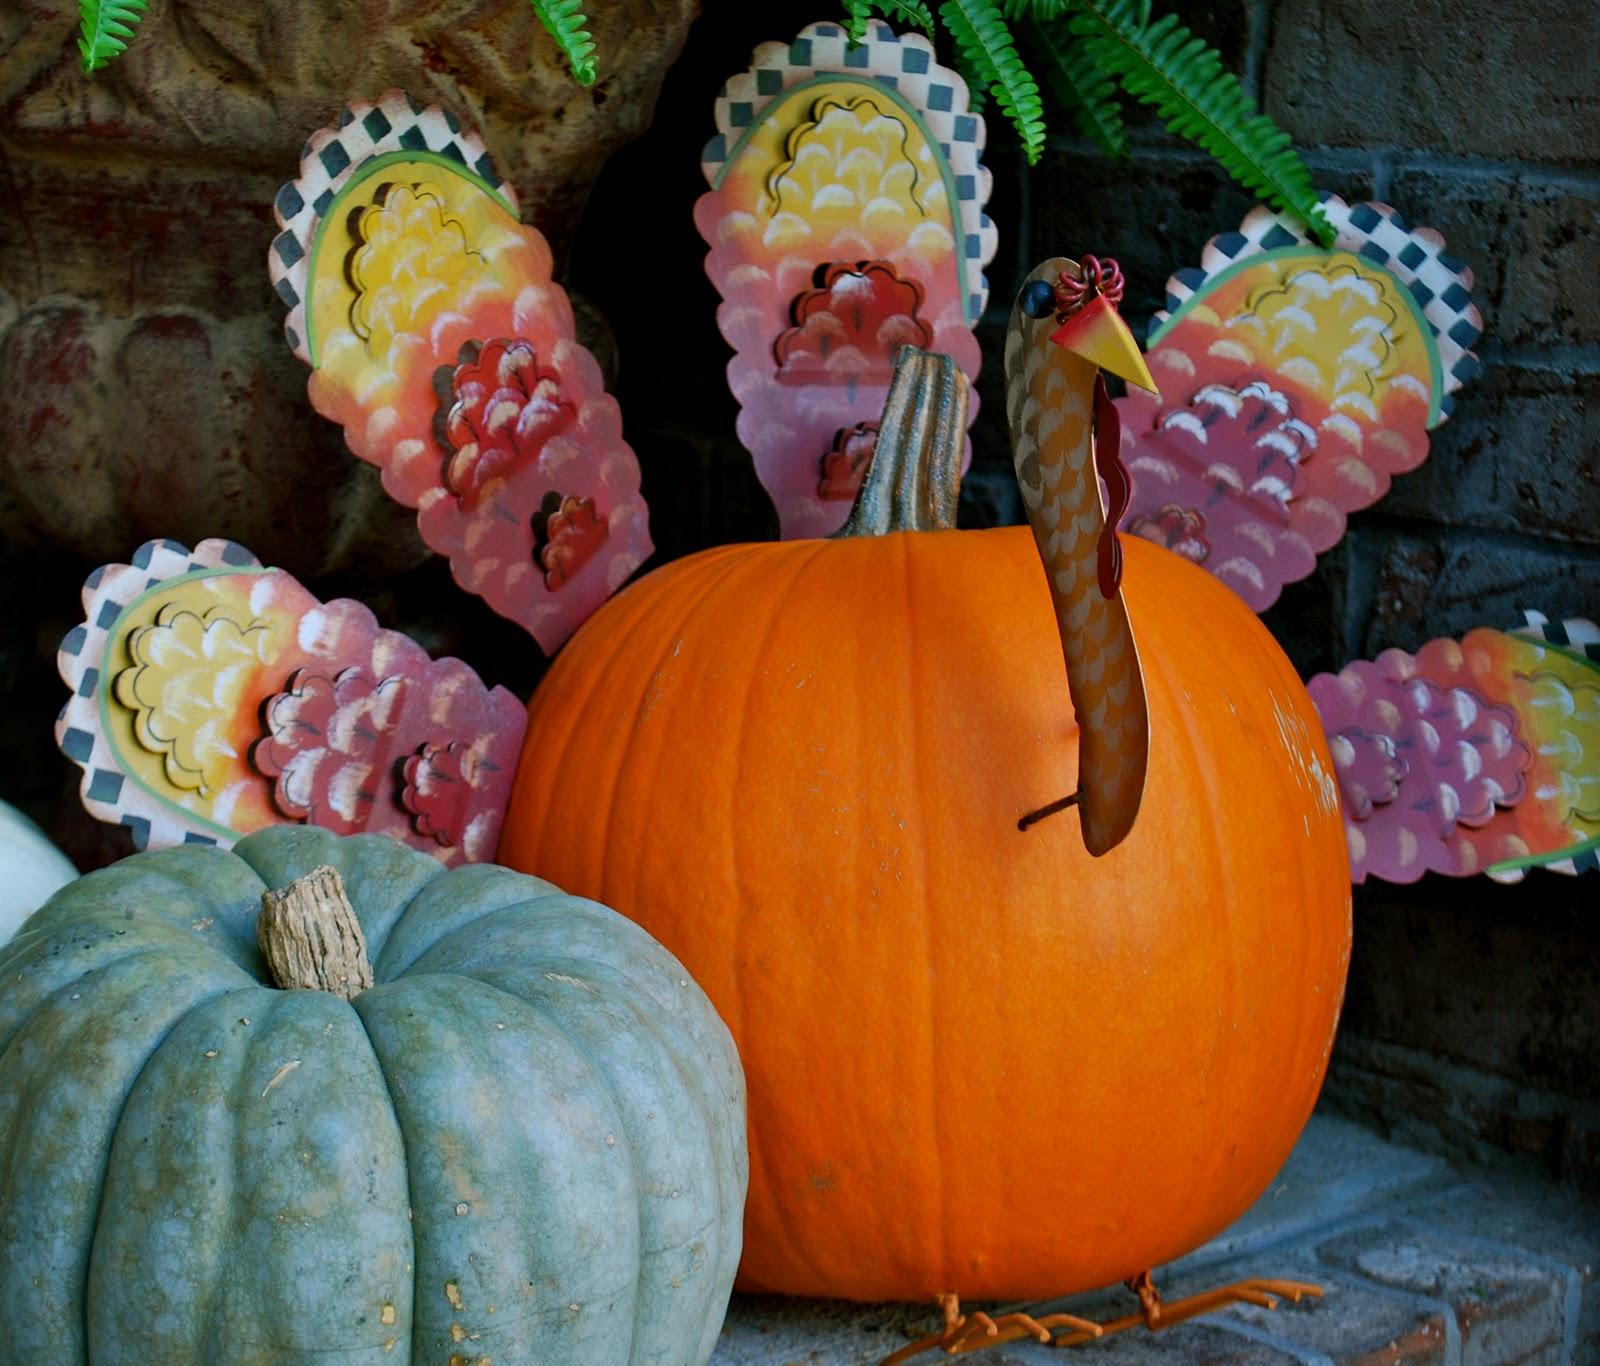 Turkey pumpkin amanda jane brown for How to decorate a pumpkin for thanksgiving